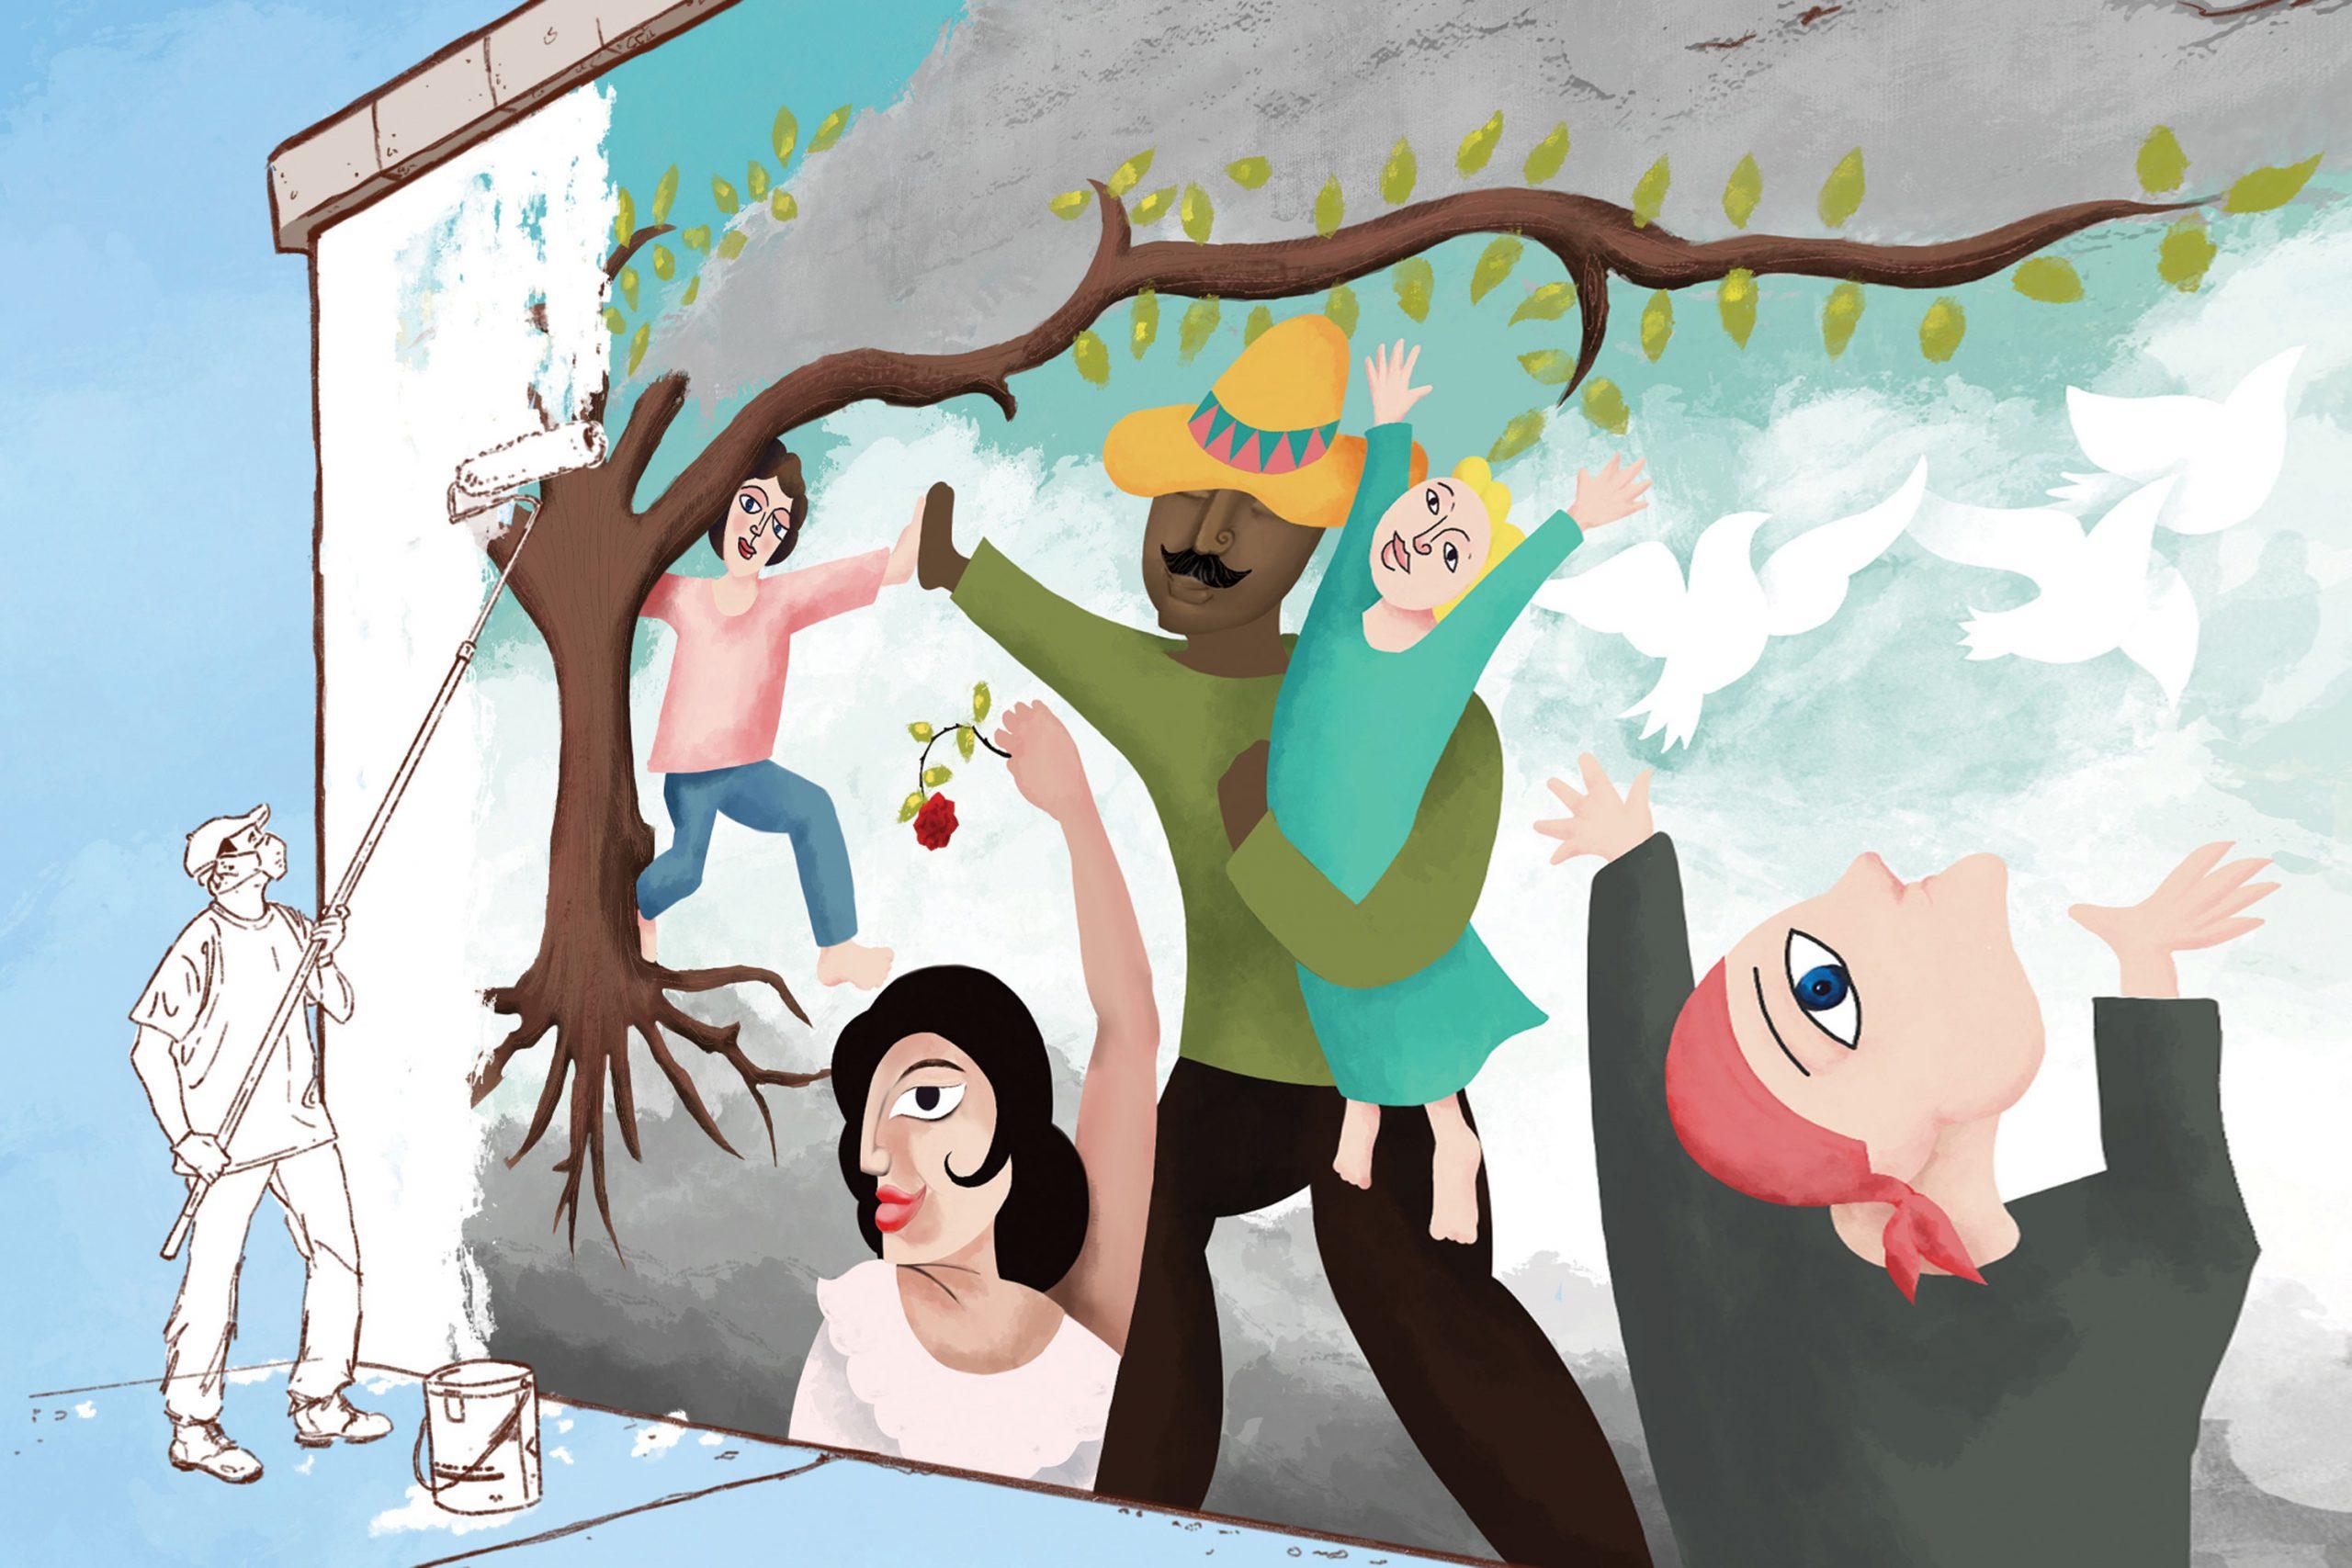 Illustration by Cedric Cummings